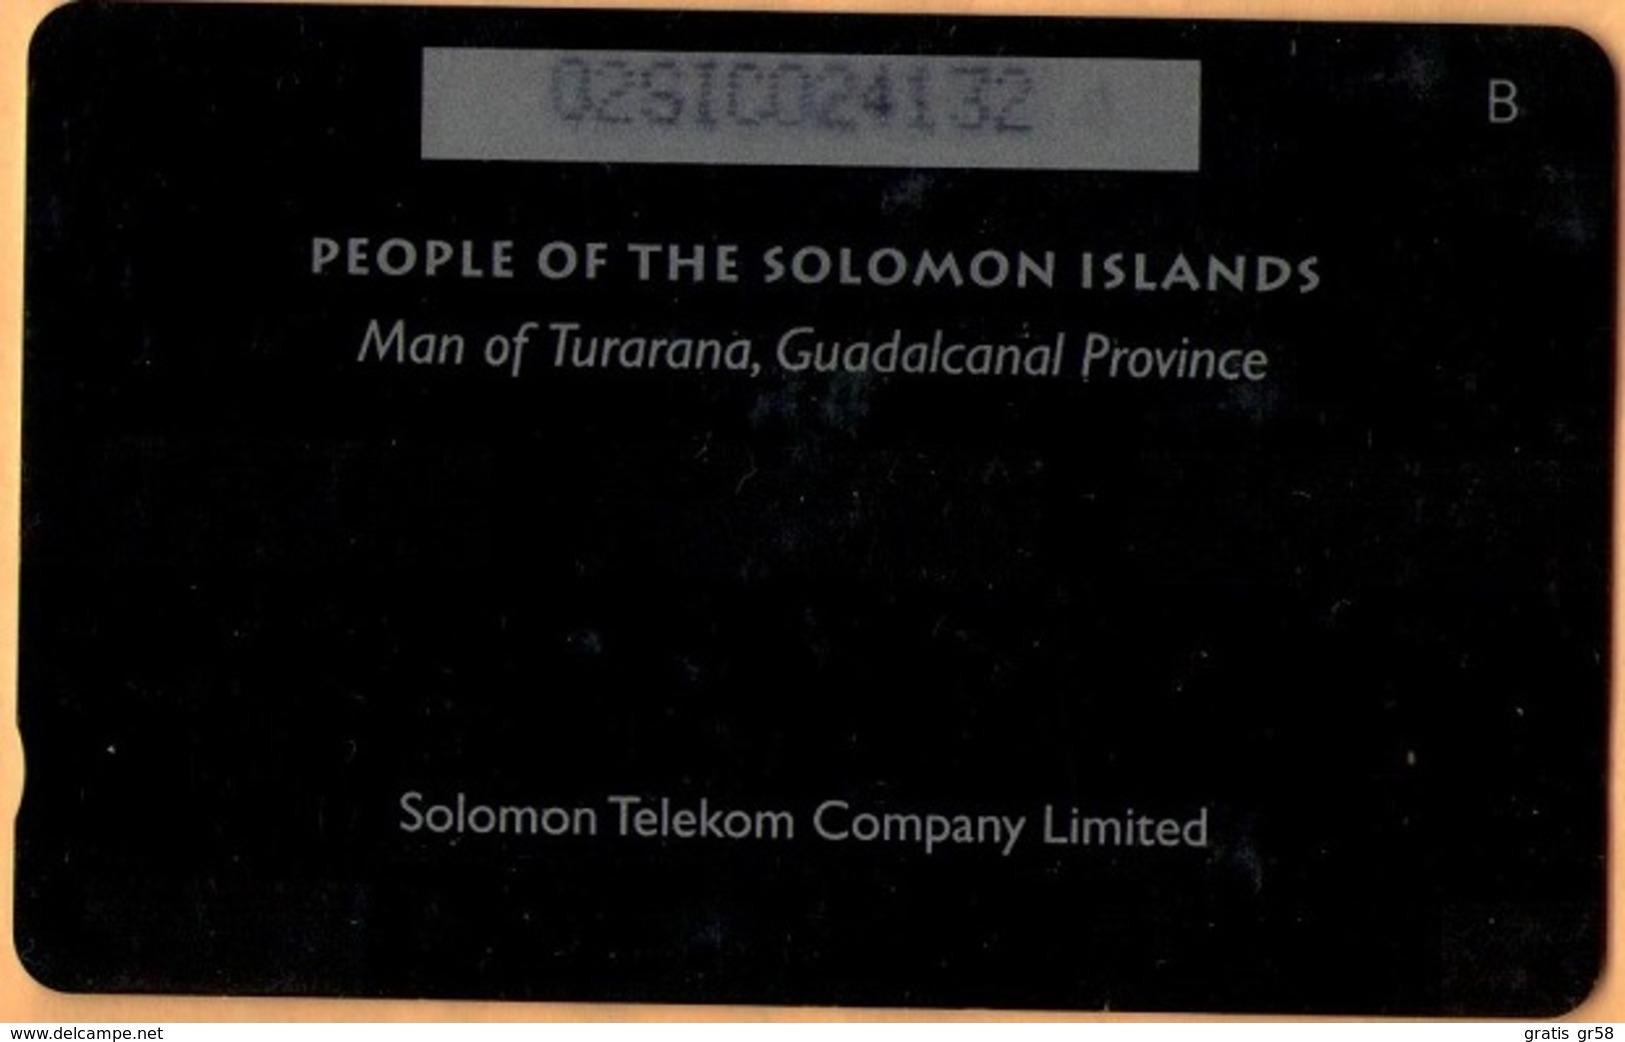 Solomon Island - SOL-05A, GPT, Man Of Turarana (Letter B), 10SI$, 1993, Used, Faded CN See Pics - Isole Salomon